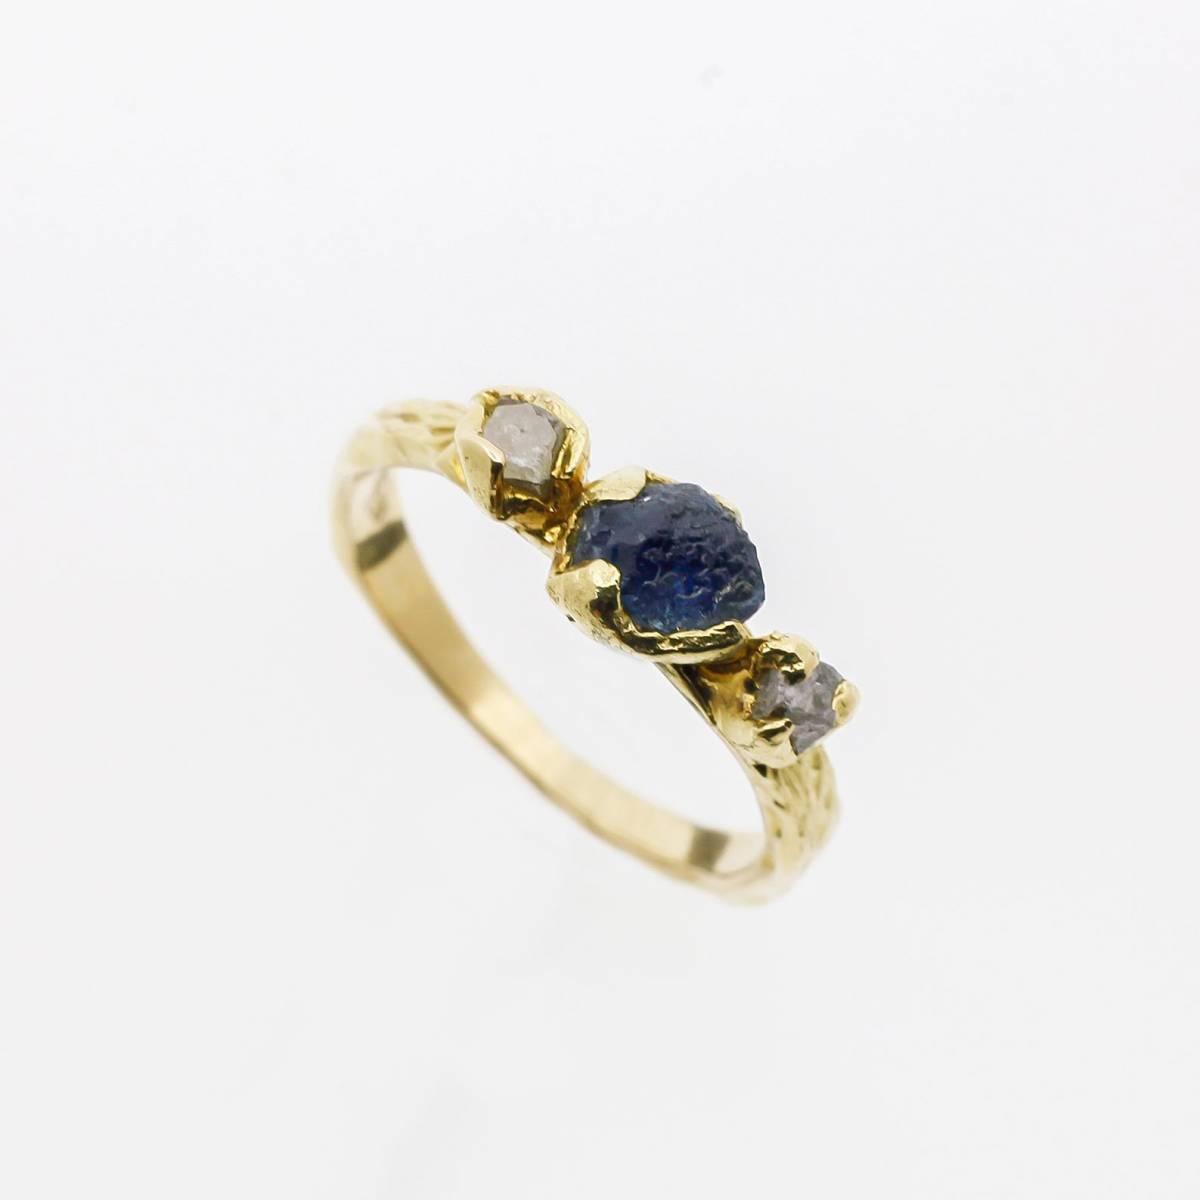 Jonas Maes Jewels - Juwelen - Bruidsjuwelen - Verlovingsring - Trouwring - House of Weddings - 23